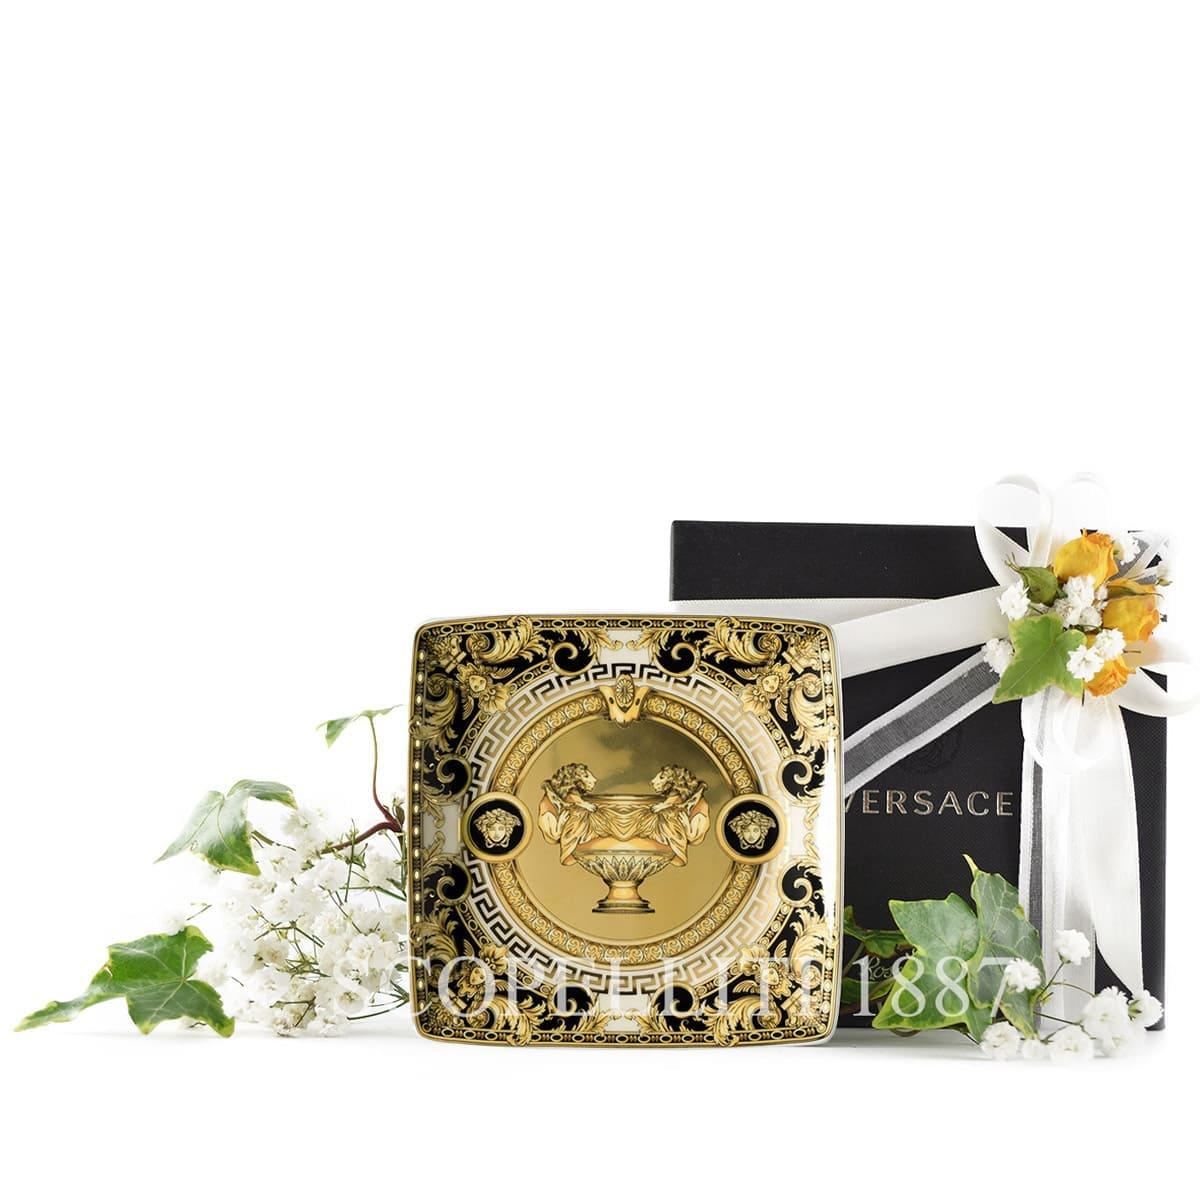 versace italian design prestige gala square dish golden black